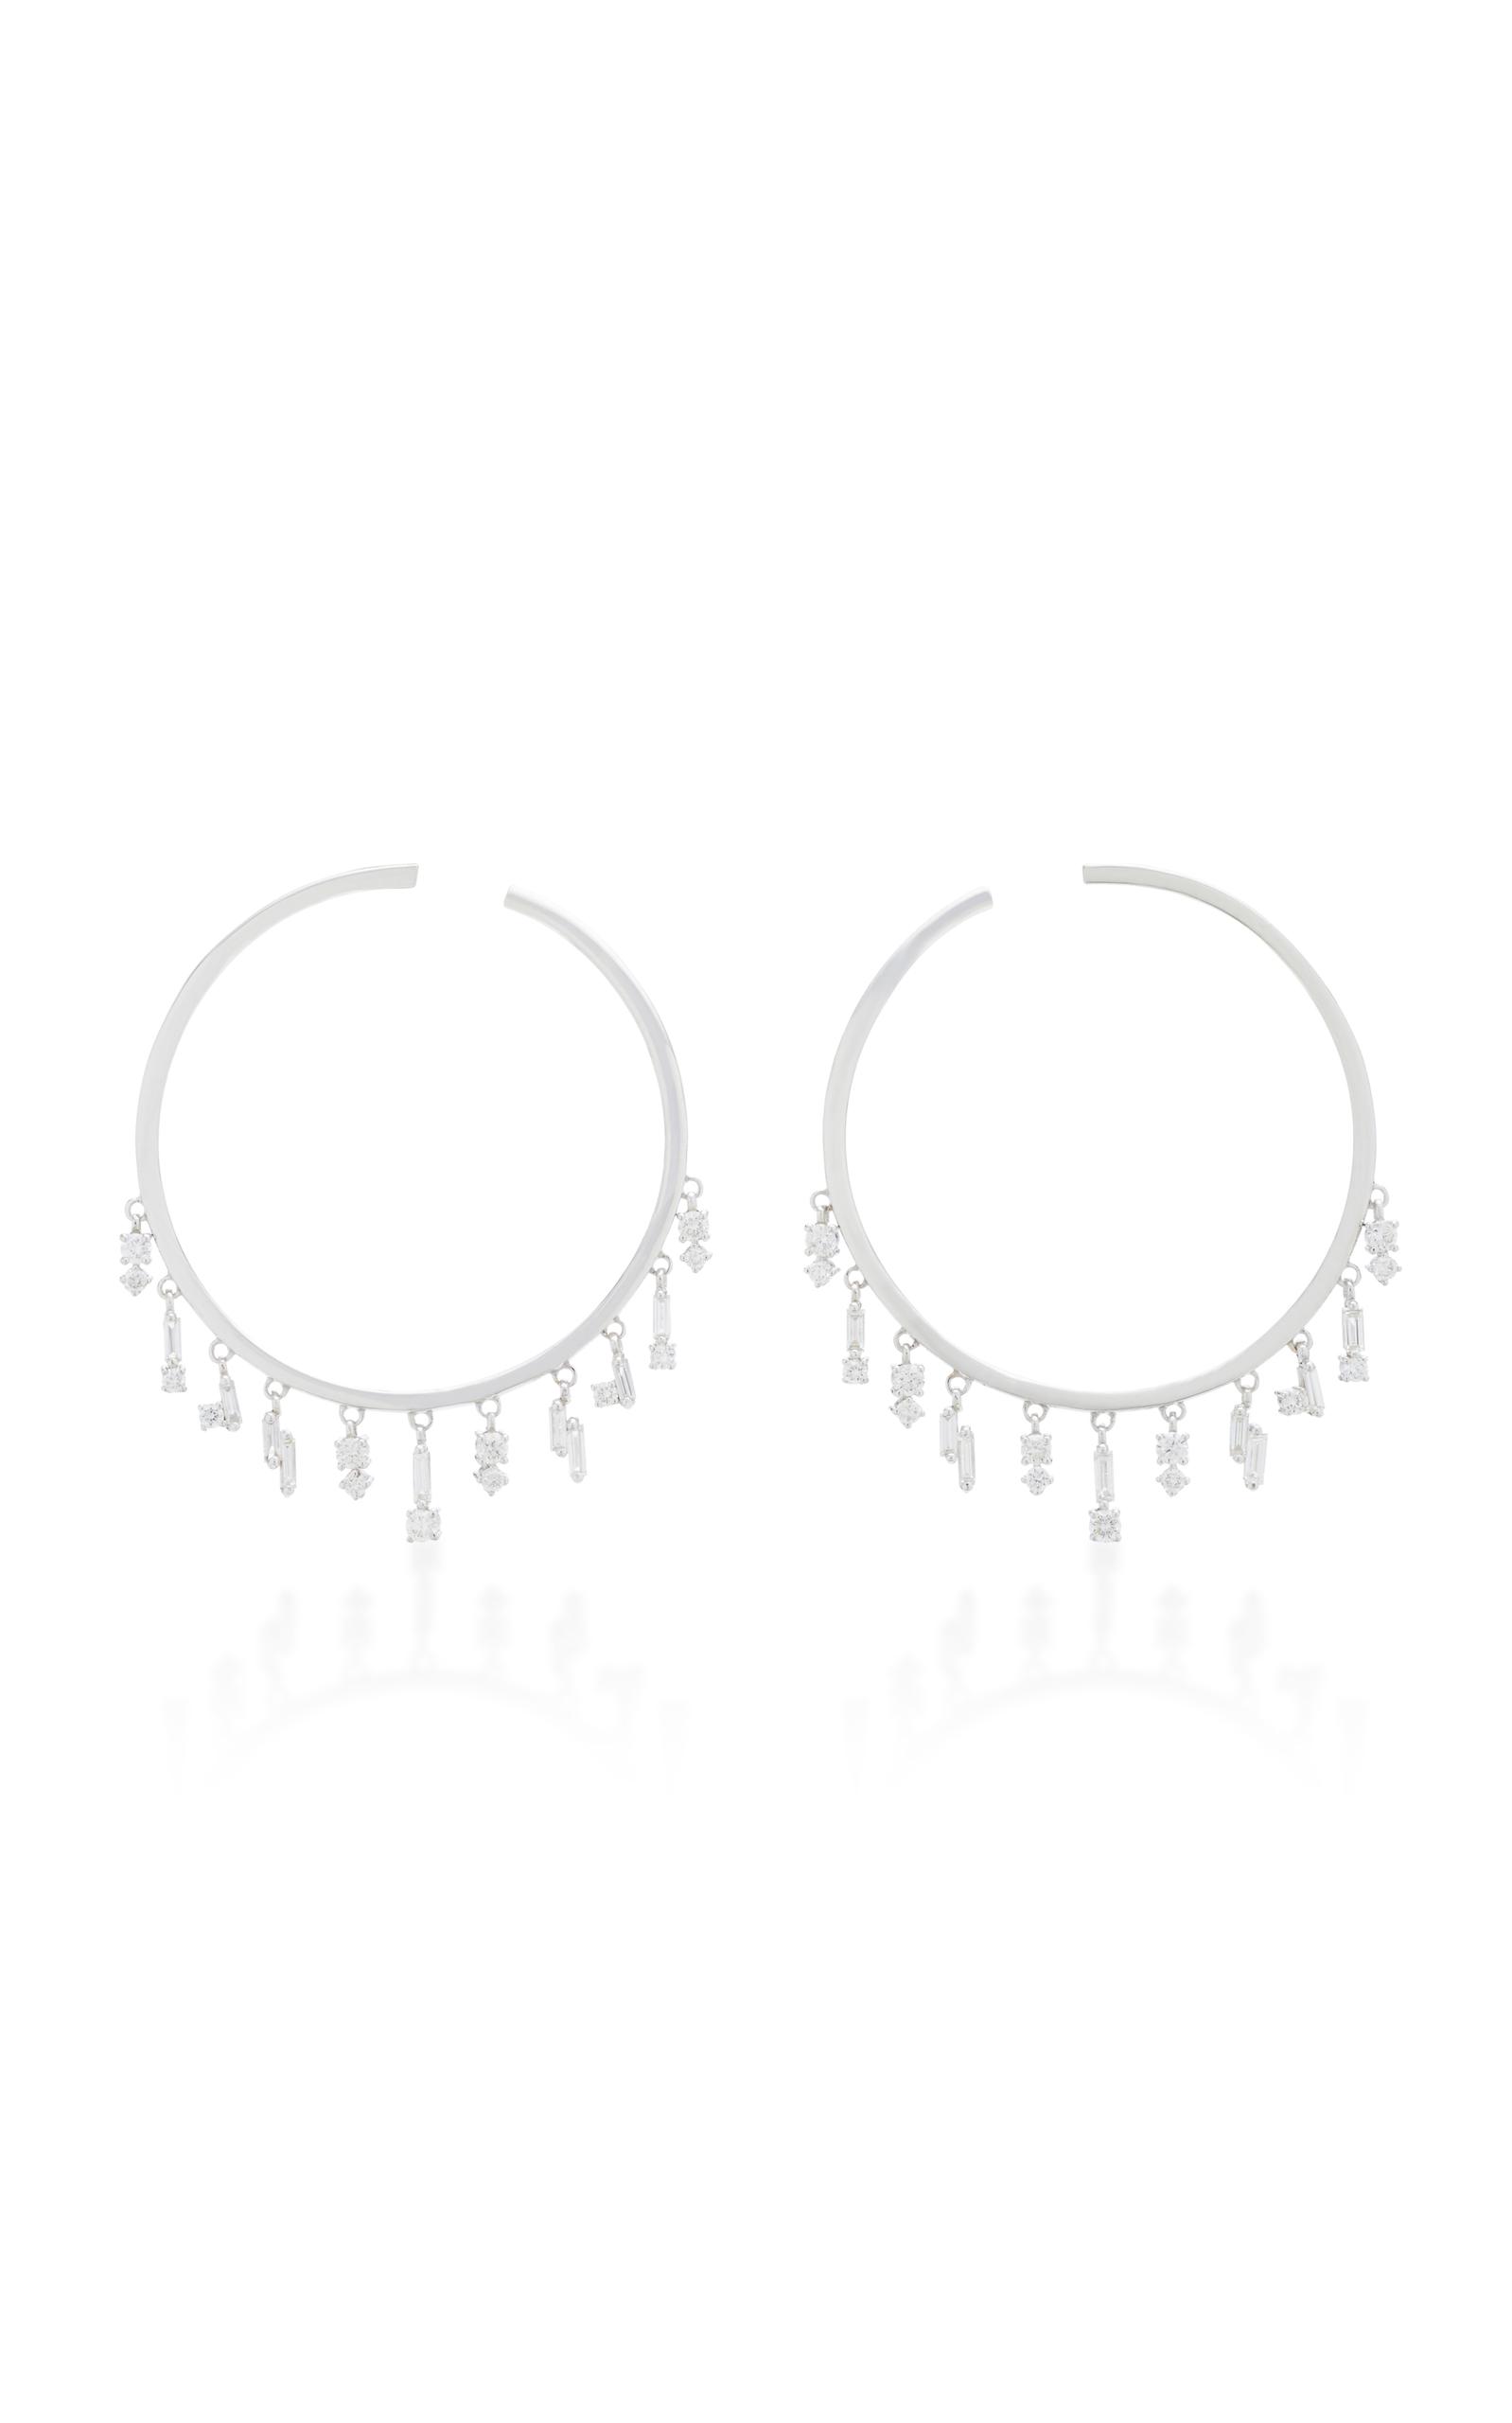 Suzanne Kalan – Women's 18K White Gold and Diamond Hoop Earrings  – White – Moda Operandi